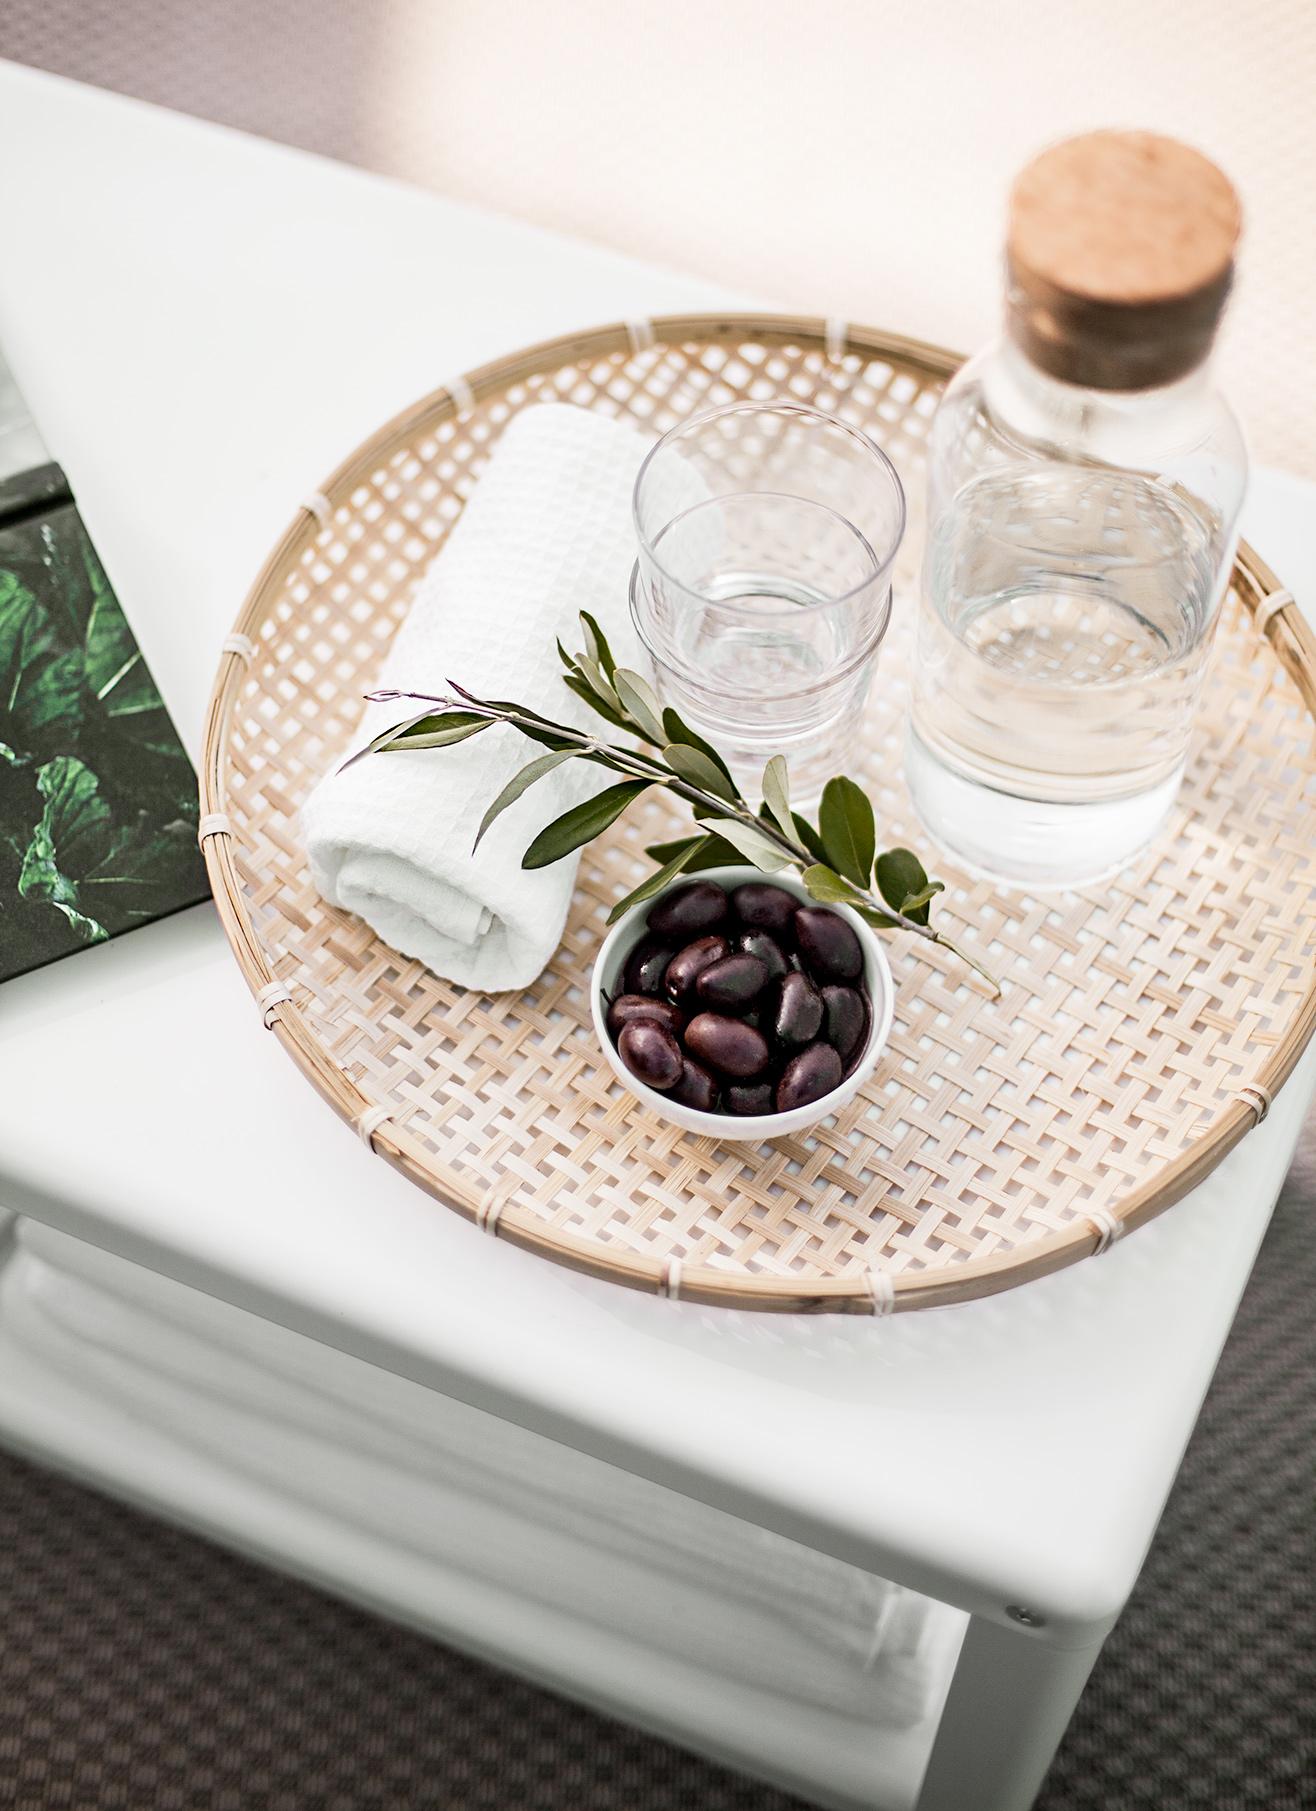 Pool-lounge-2 IKEA Livet Hemma copyright 2016 Anna Malmberg